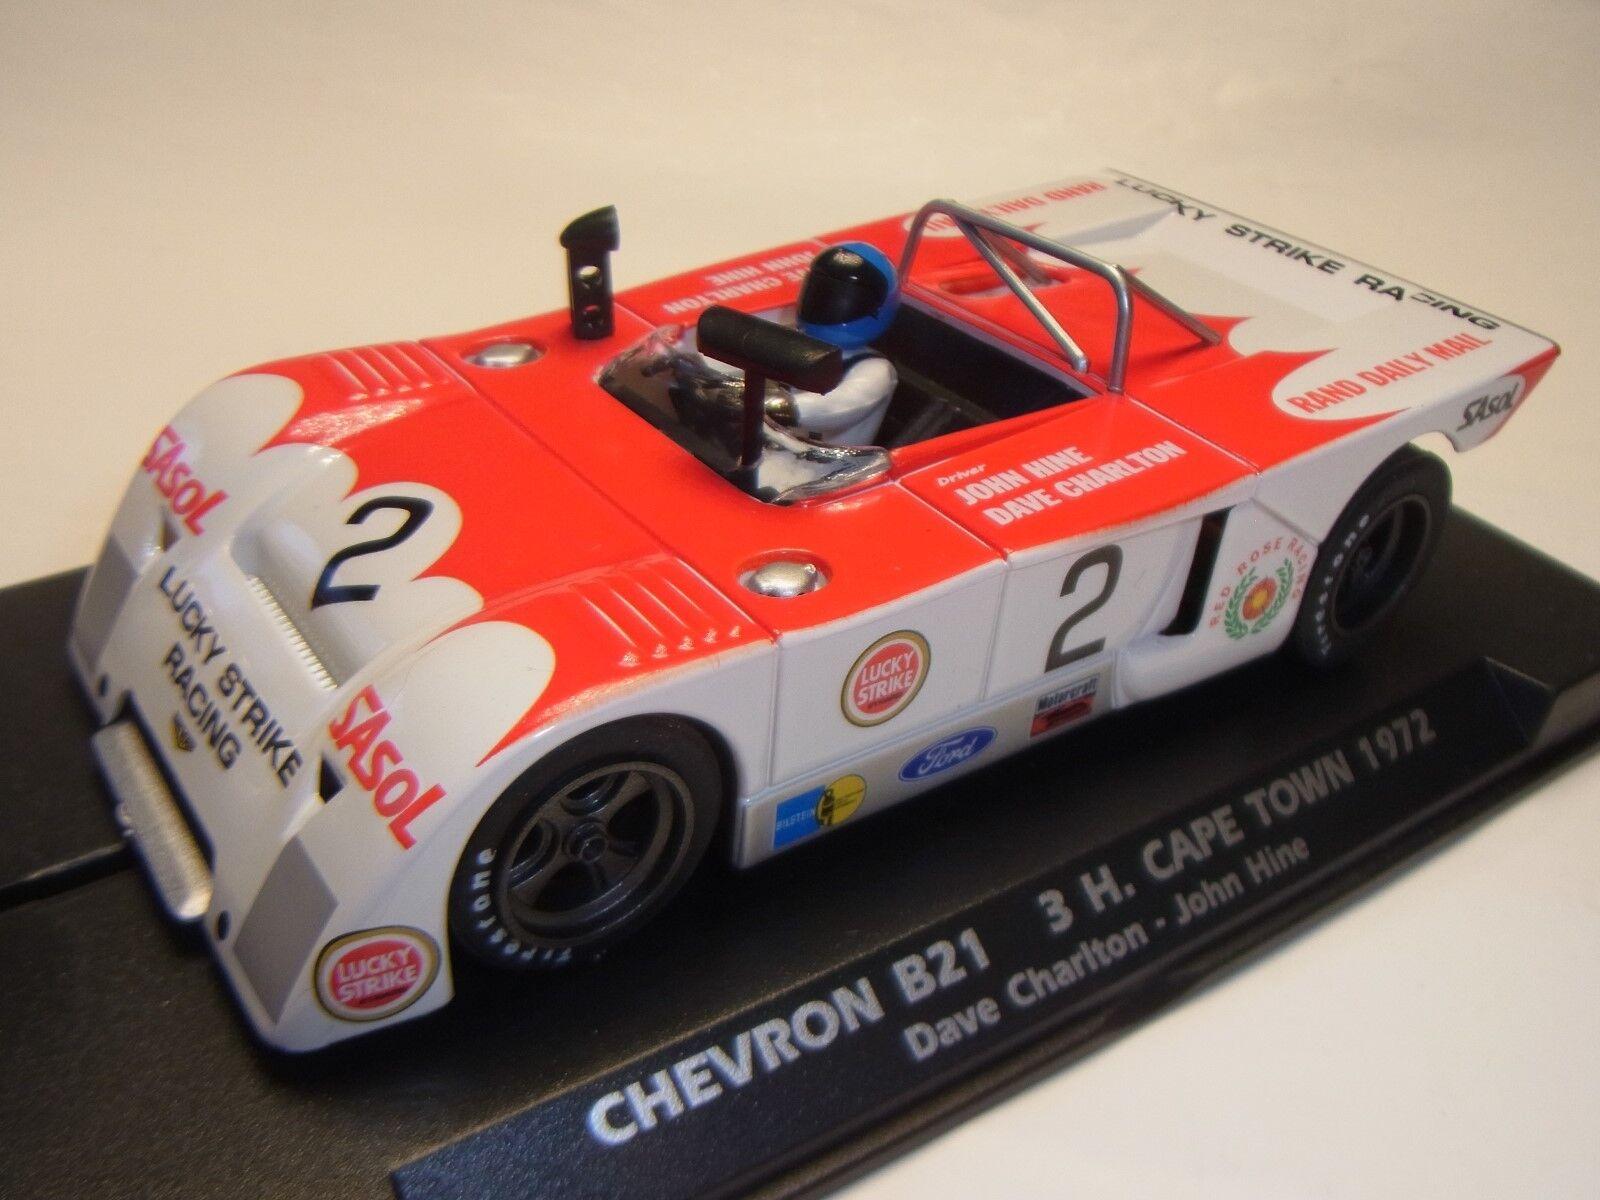 Flyslot Chevron B21 Cape Town 1972 F024102 para Circuito de Slot 1  3 2Slot